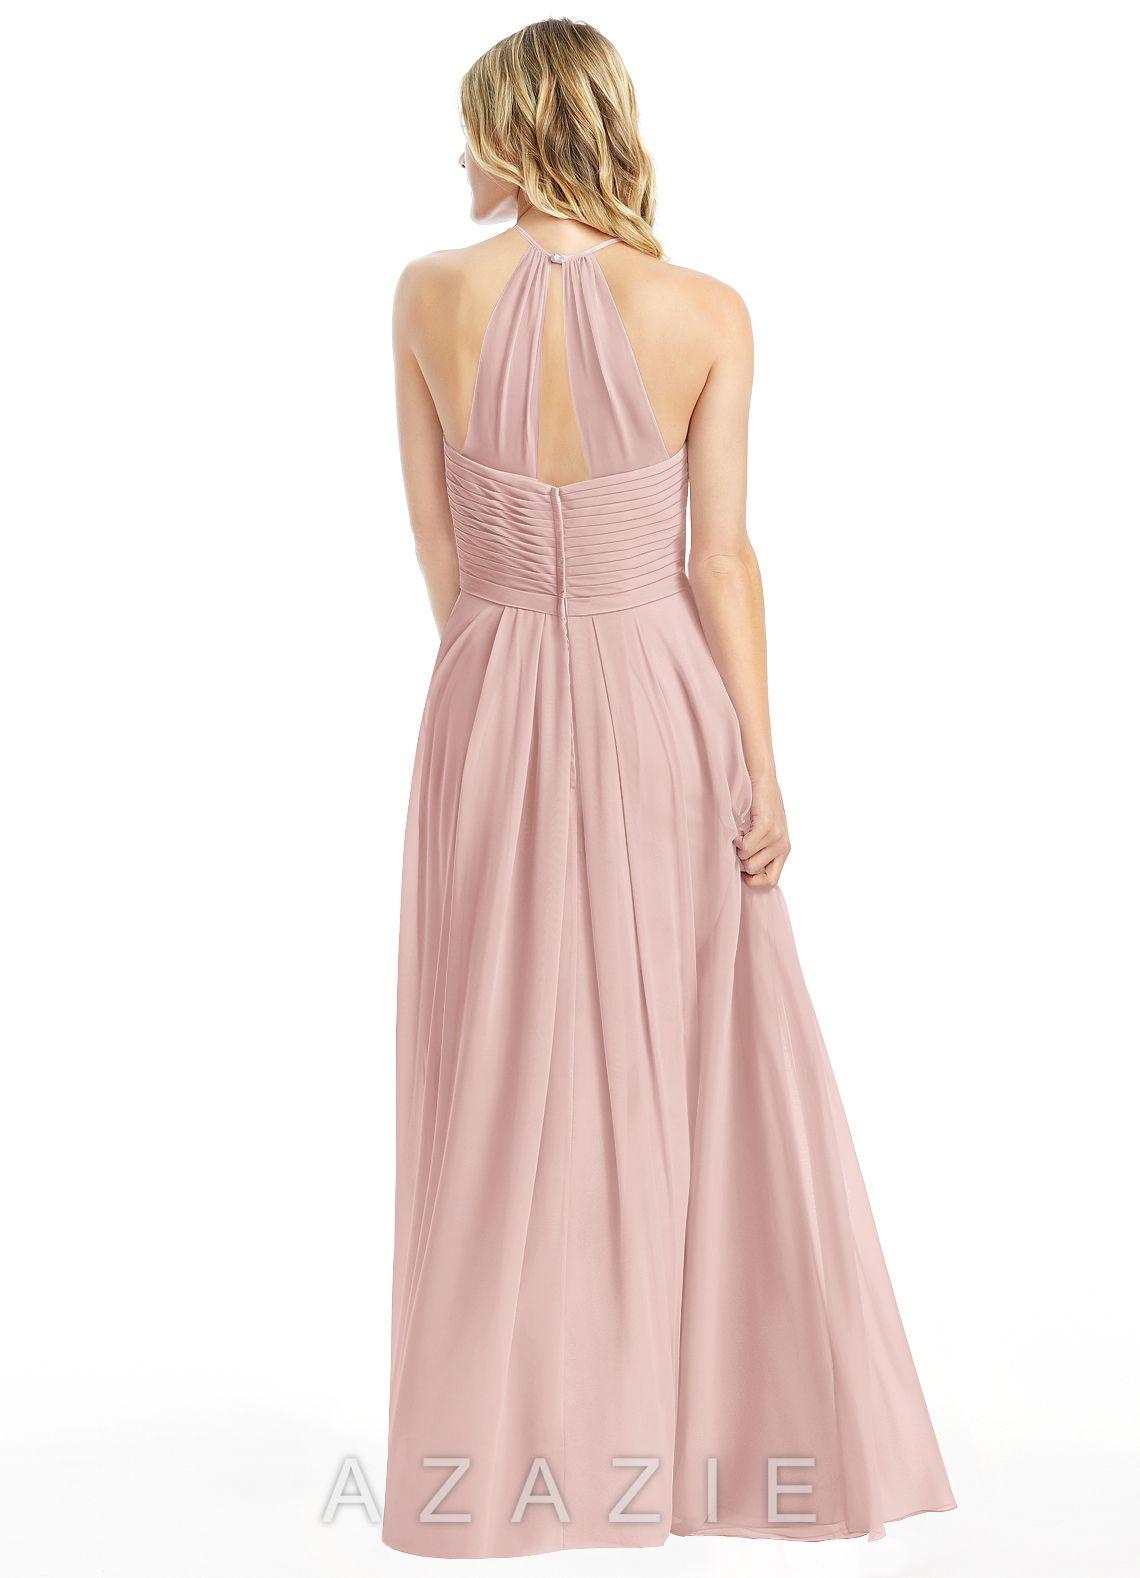 94c1529a21a Azazie Ginger Bridesmaid Dress - Coral